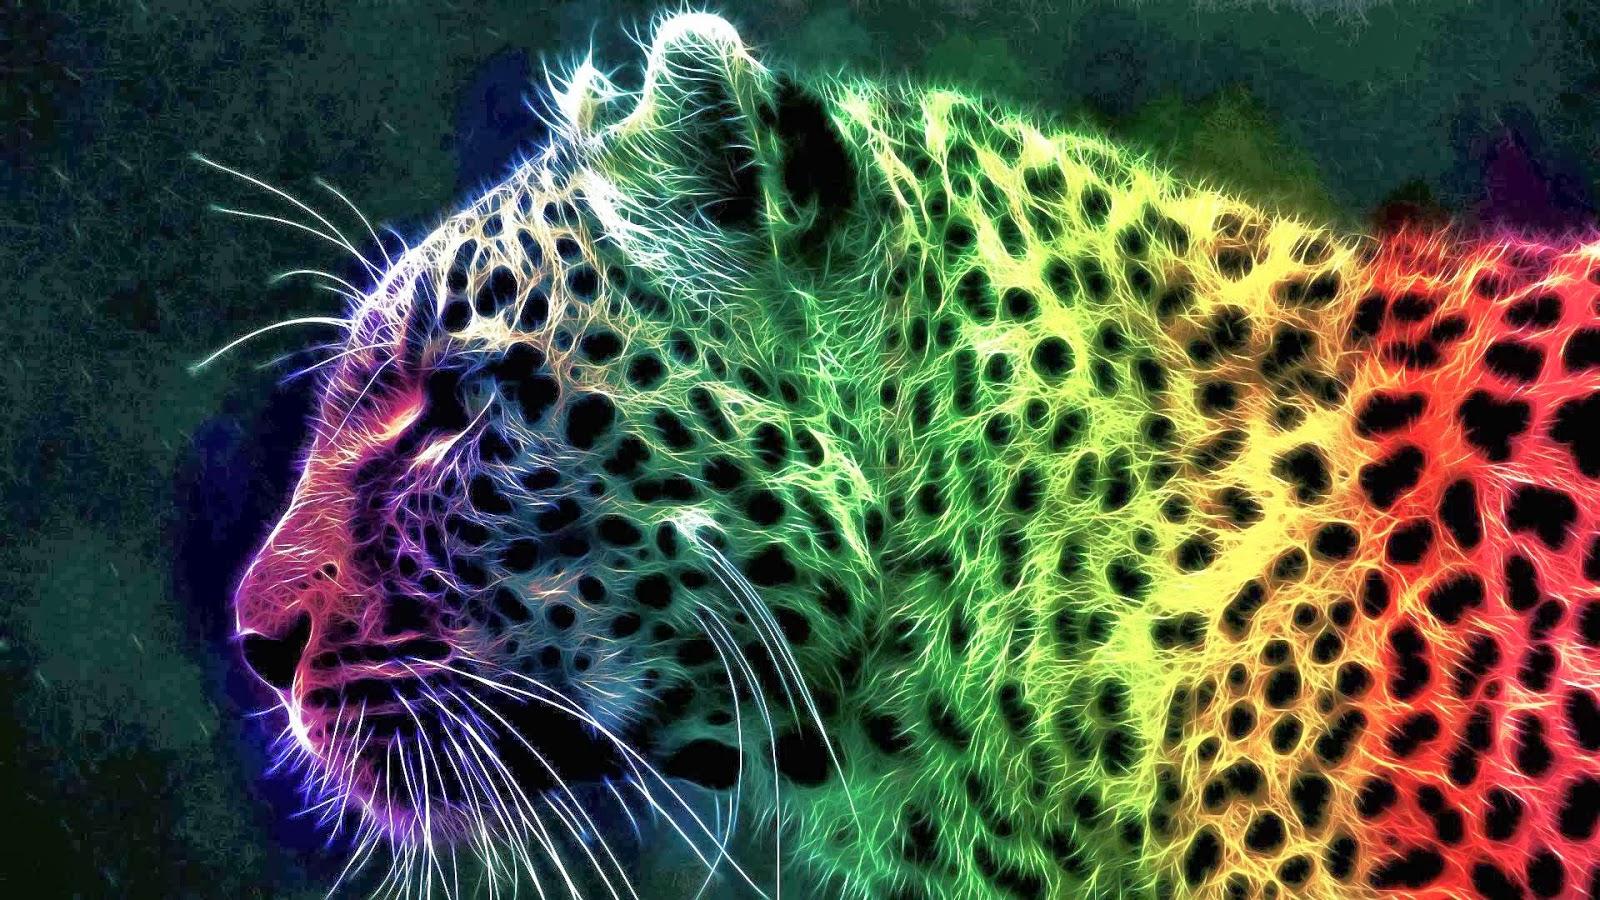 Rainbow Cheetah Wallpaper Best Windows 7 Wallpapers